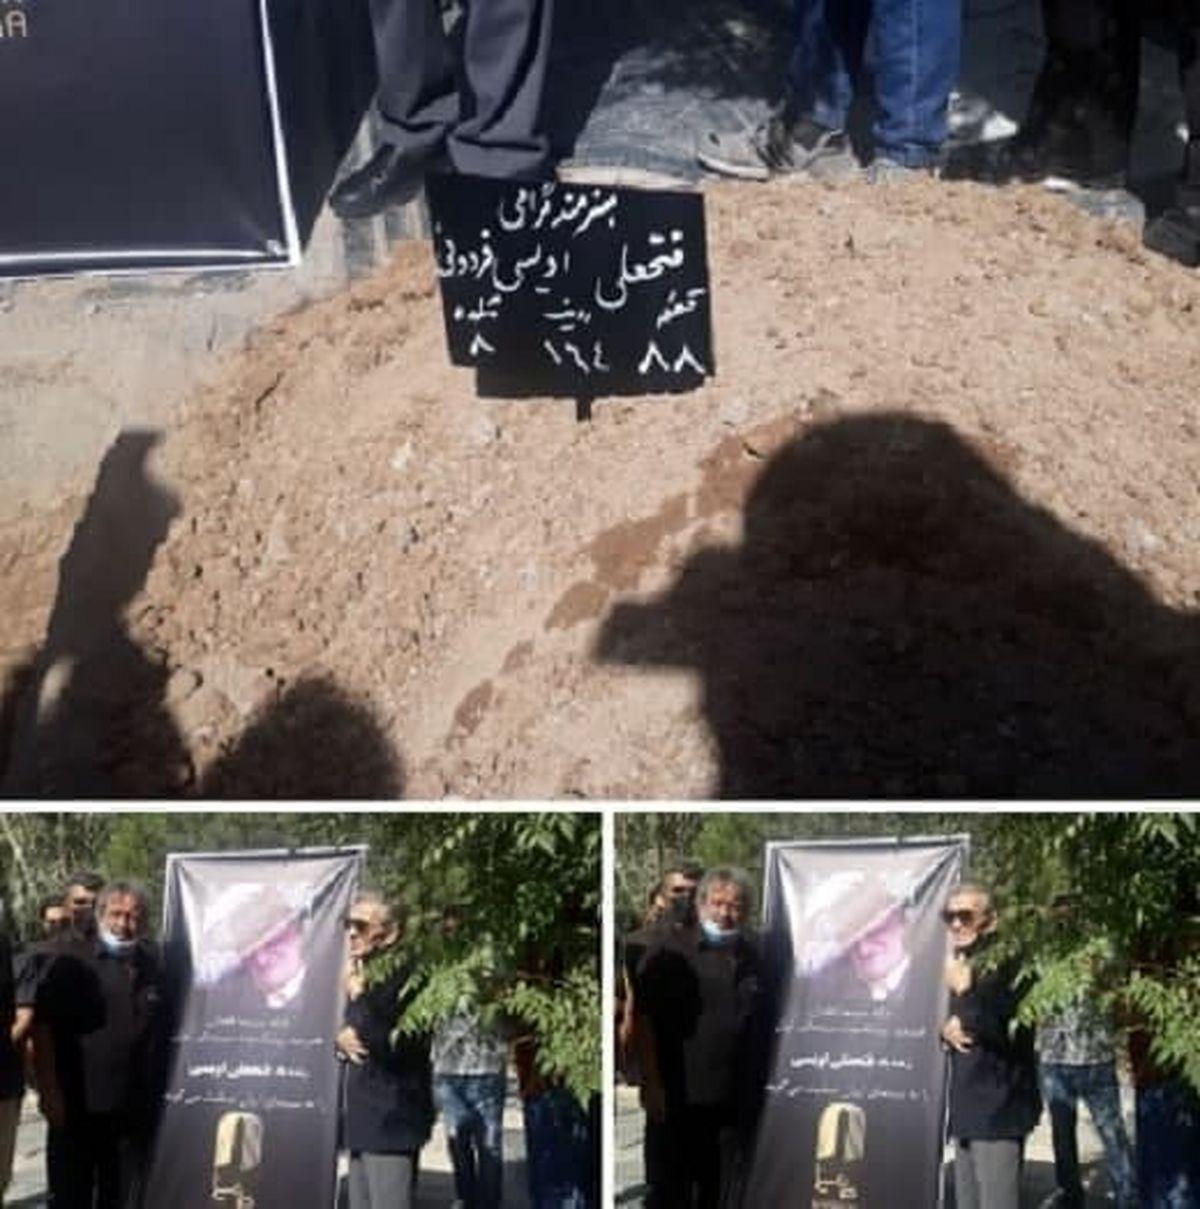 مراسم تشییع و تدفین پیکر فتحعلی اویسی +عکس